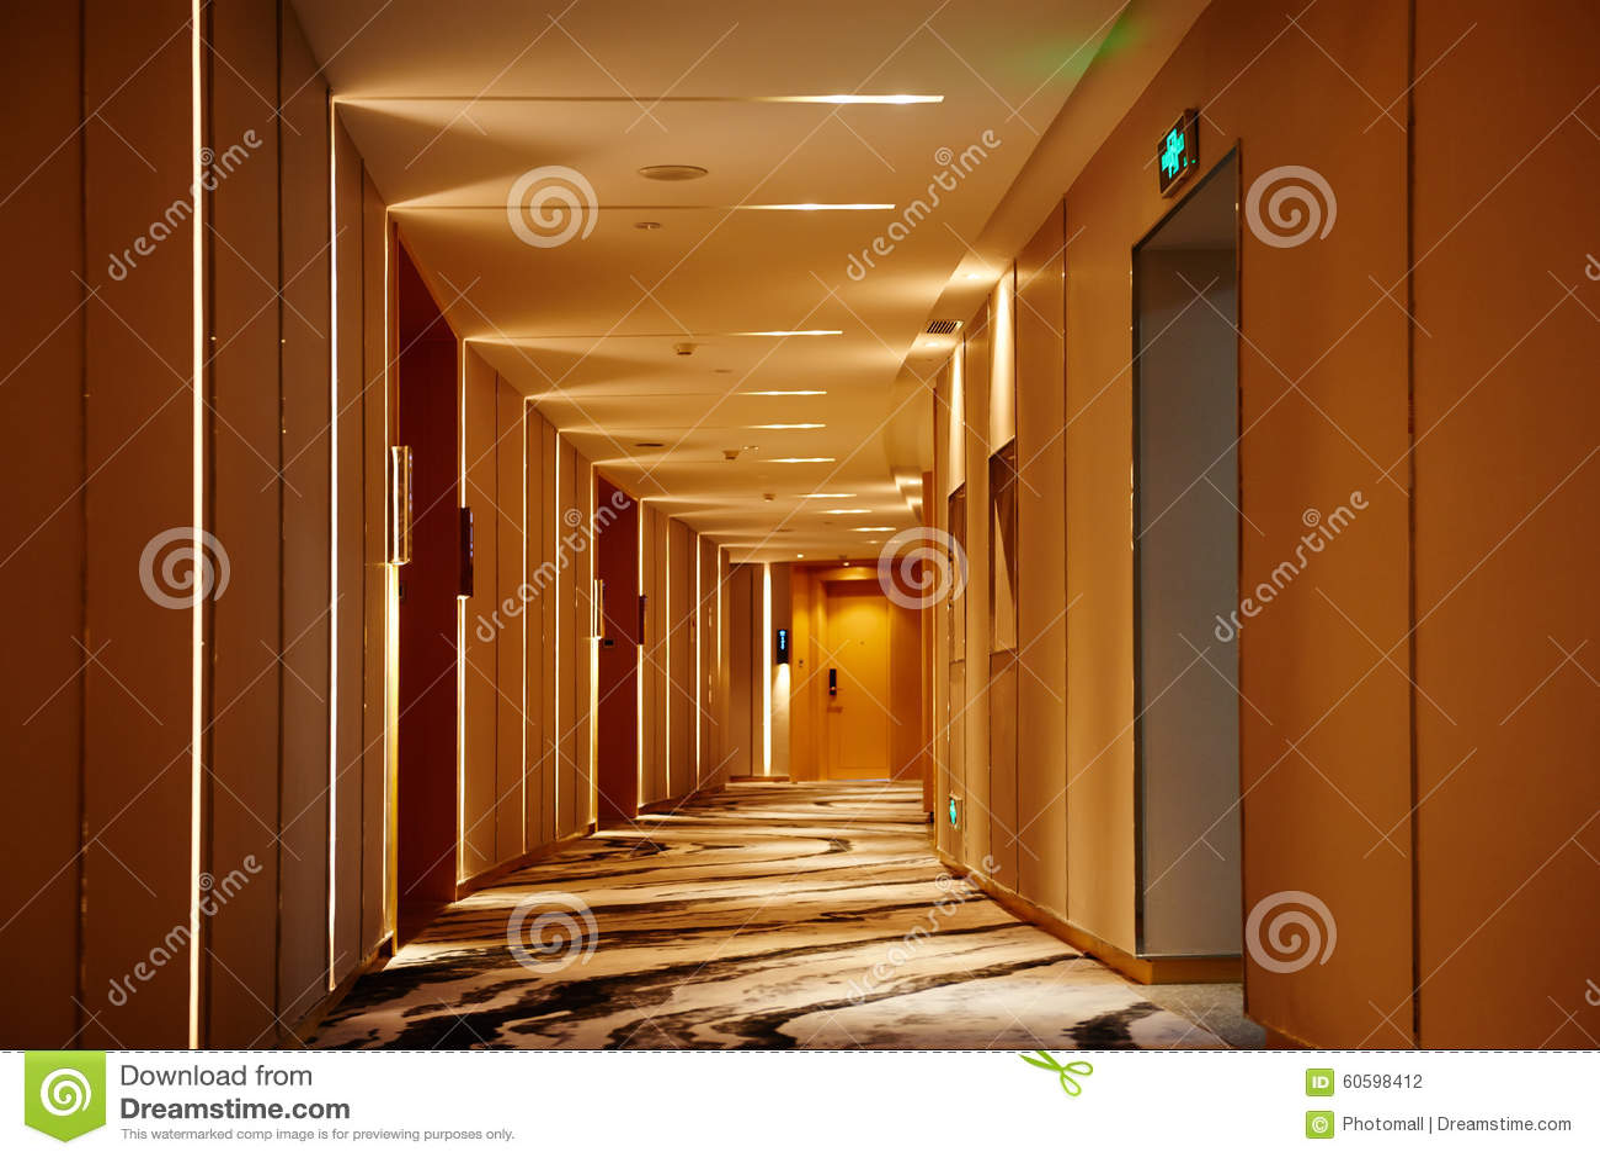 Hotel Corridor Lobby Stock Photo Image 60598412